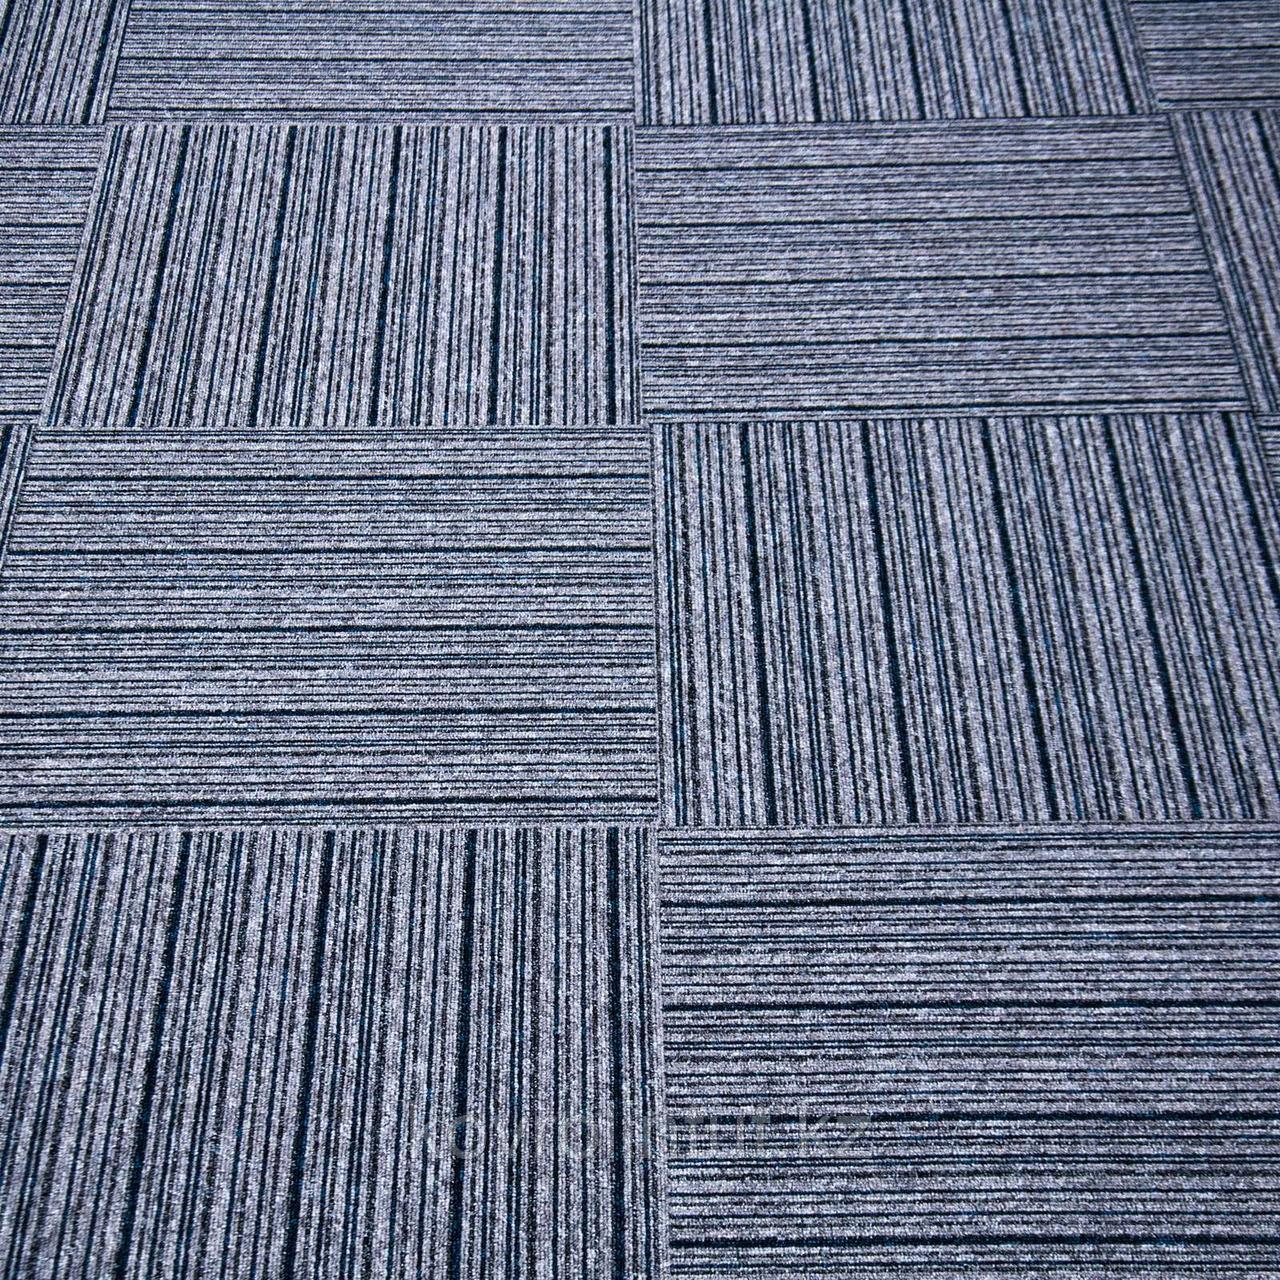 Плитка ковровая Сondor, Solid stripe 175, 50х50, 5м2/уп